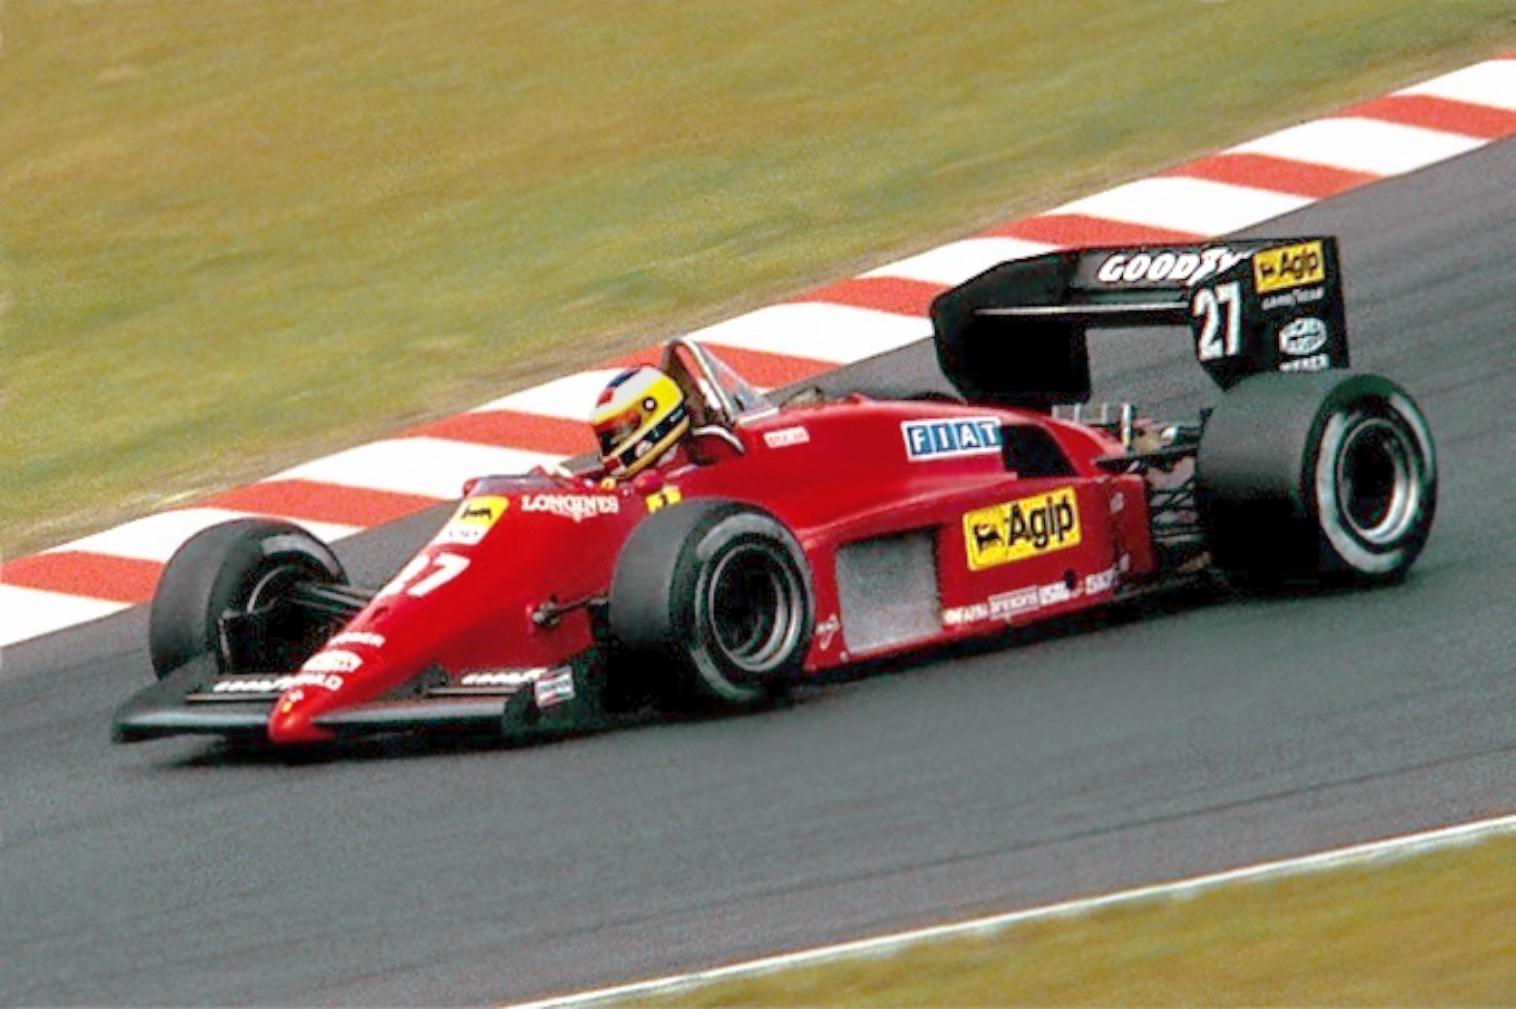 http://upload.wikimedia.org/wikipedia/commons/4/4b/Alboreto_1985-08-02.jpg